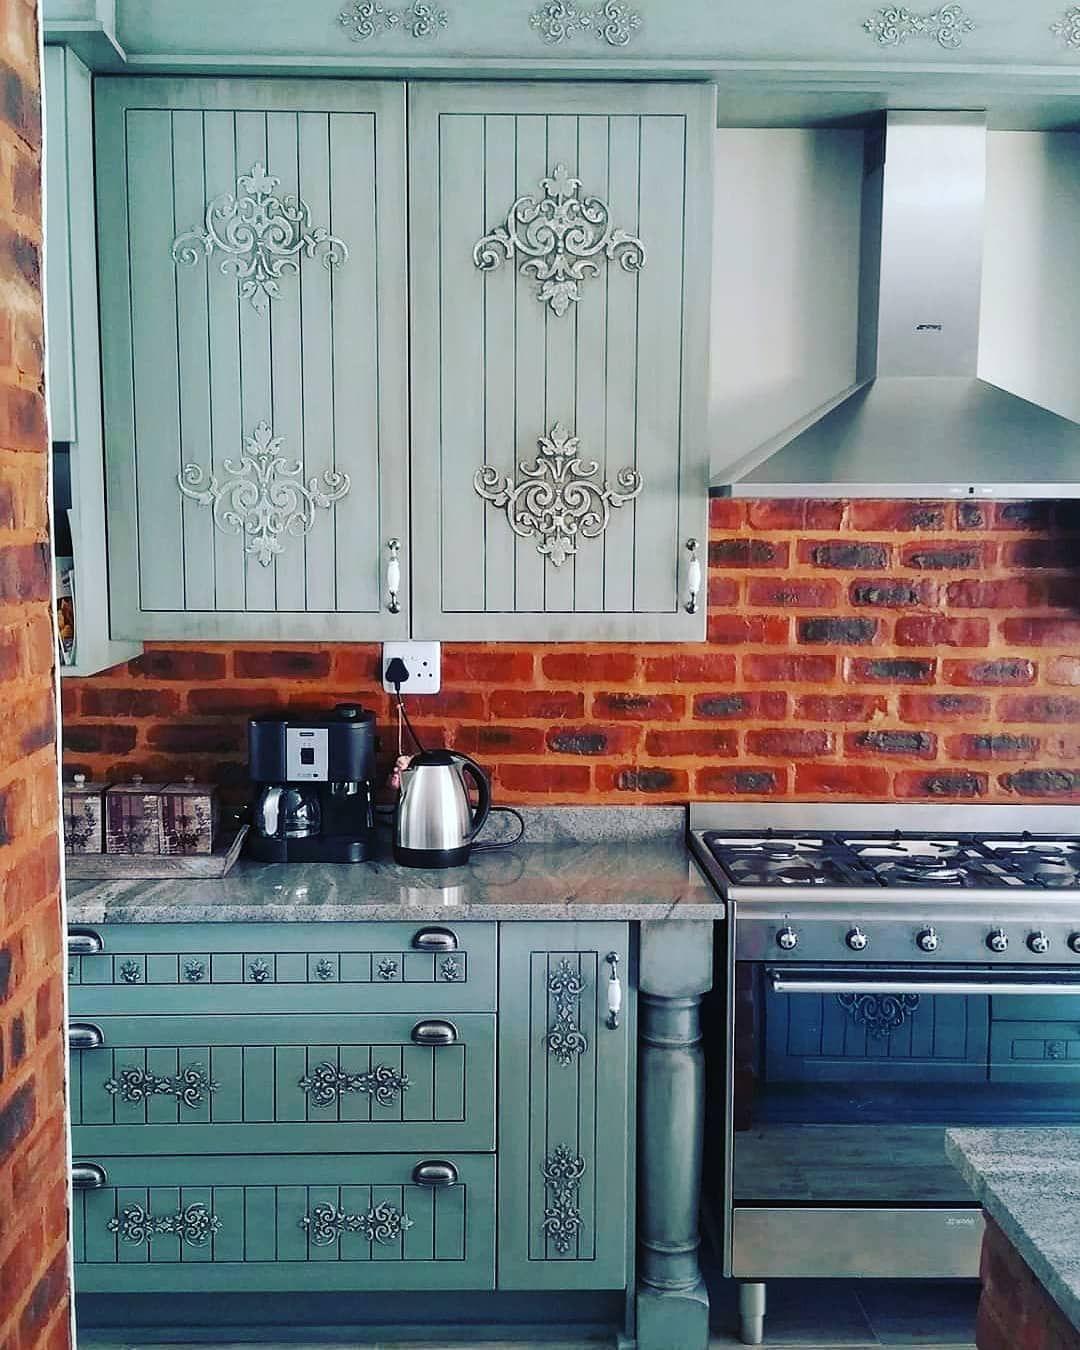 "The Chameleon on Instagram: ""#kitchendesign #kitchenrevamp #homedecor #home #decor #happycolor #pretoria #johannesburg #paint #lovetopaint #changeisgood…"""